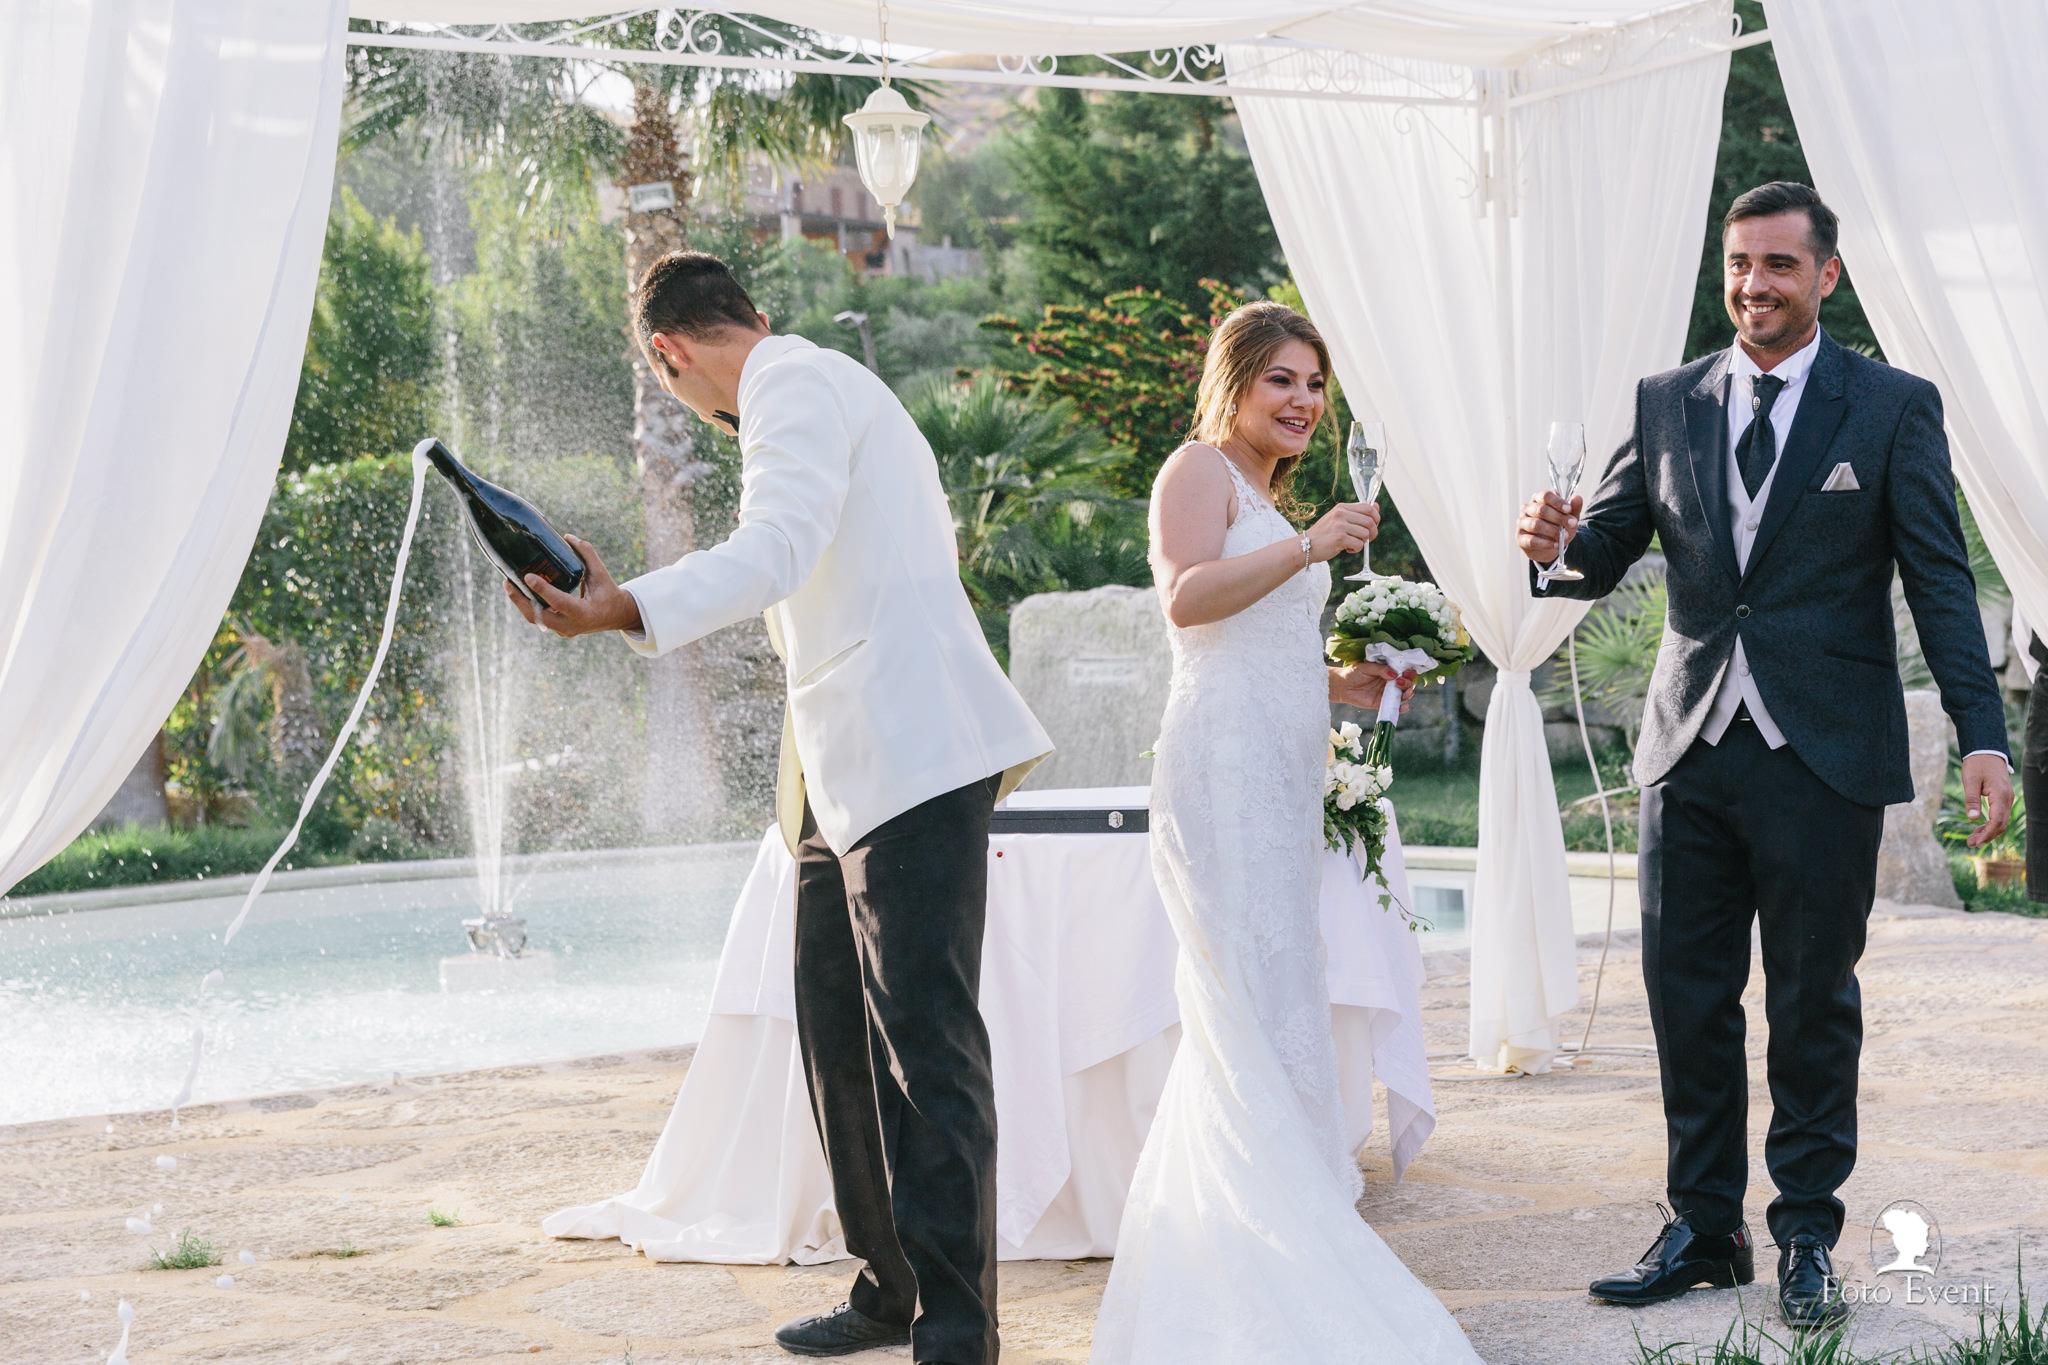 030-2019-06-12-Matrimonio-Rosa-e-Angelo-Ripellino-5DE-1179